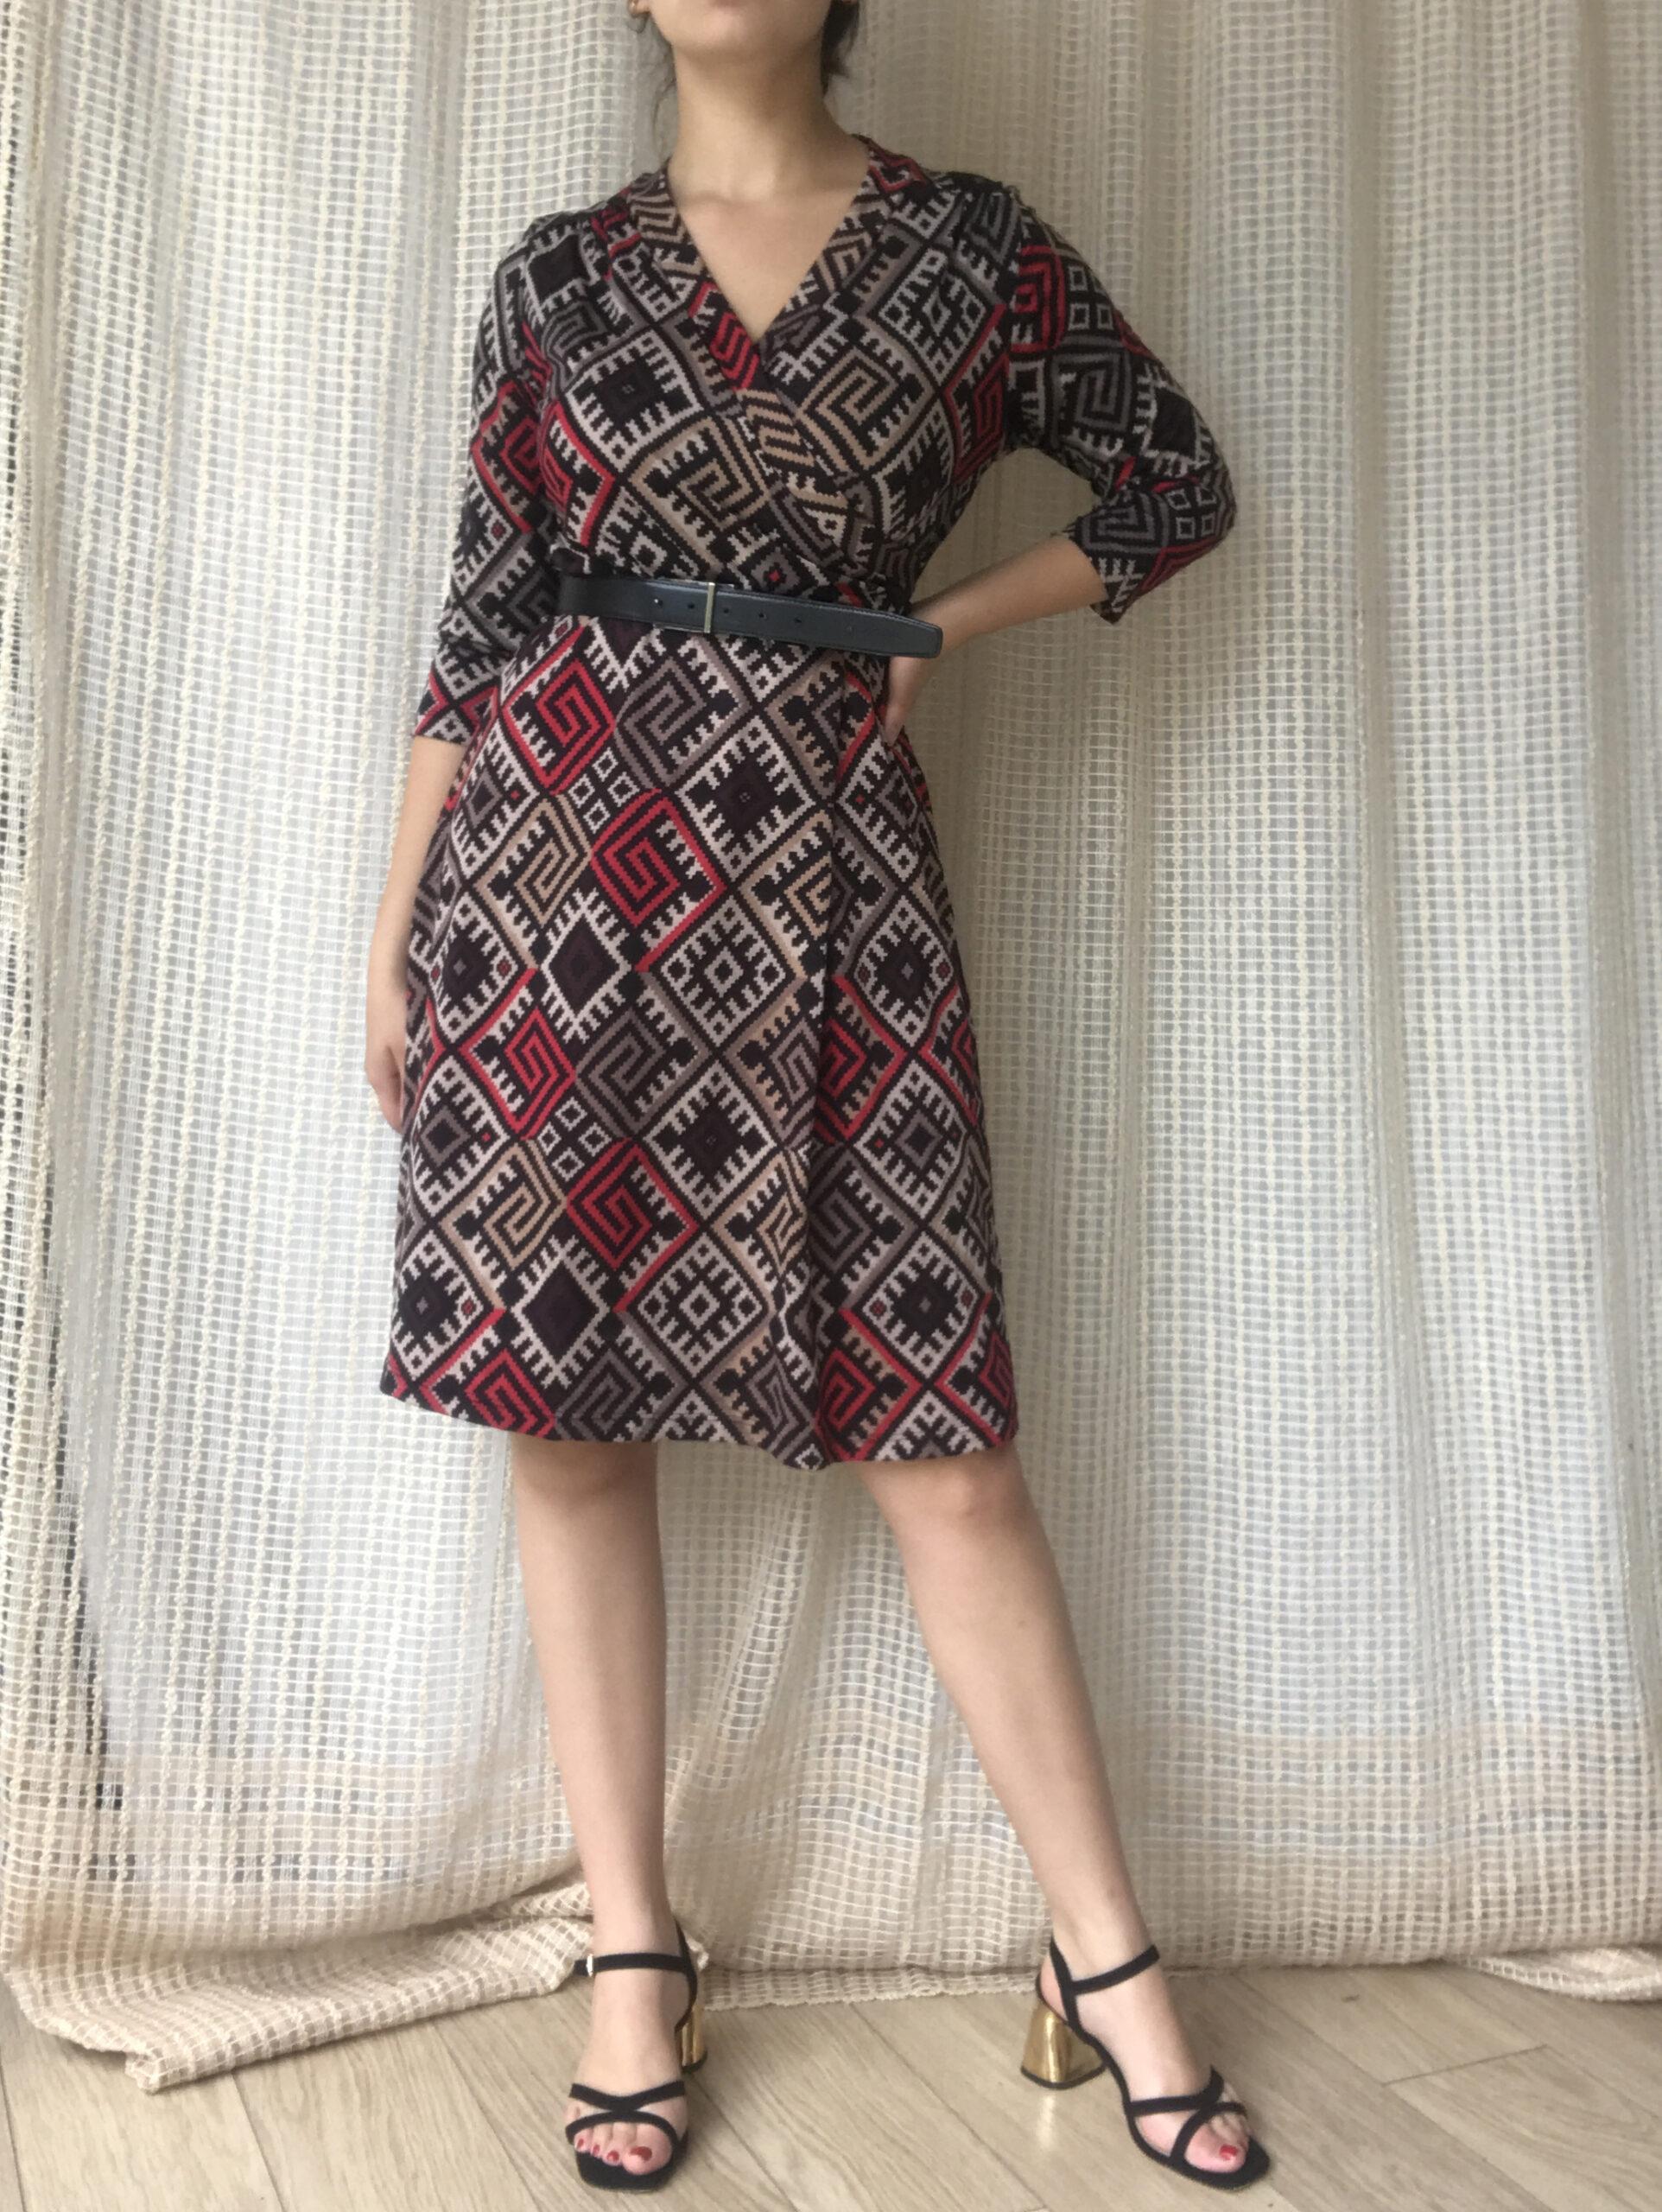 Belle Robe Cintree Motif Geometrique Vintage Annees 70 Crushon